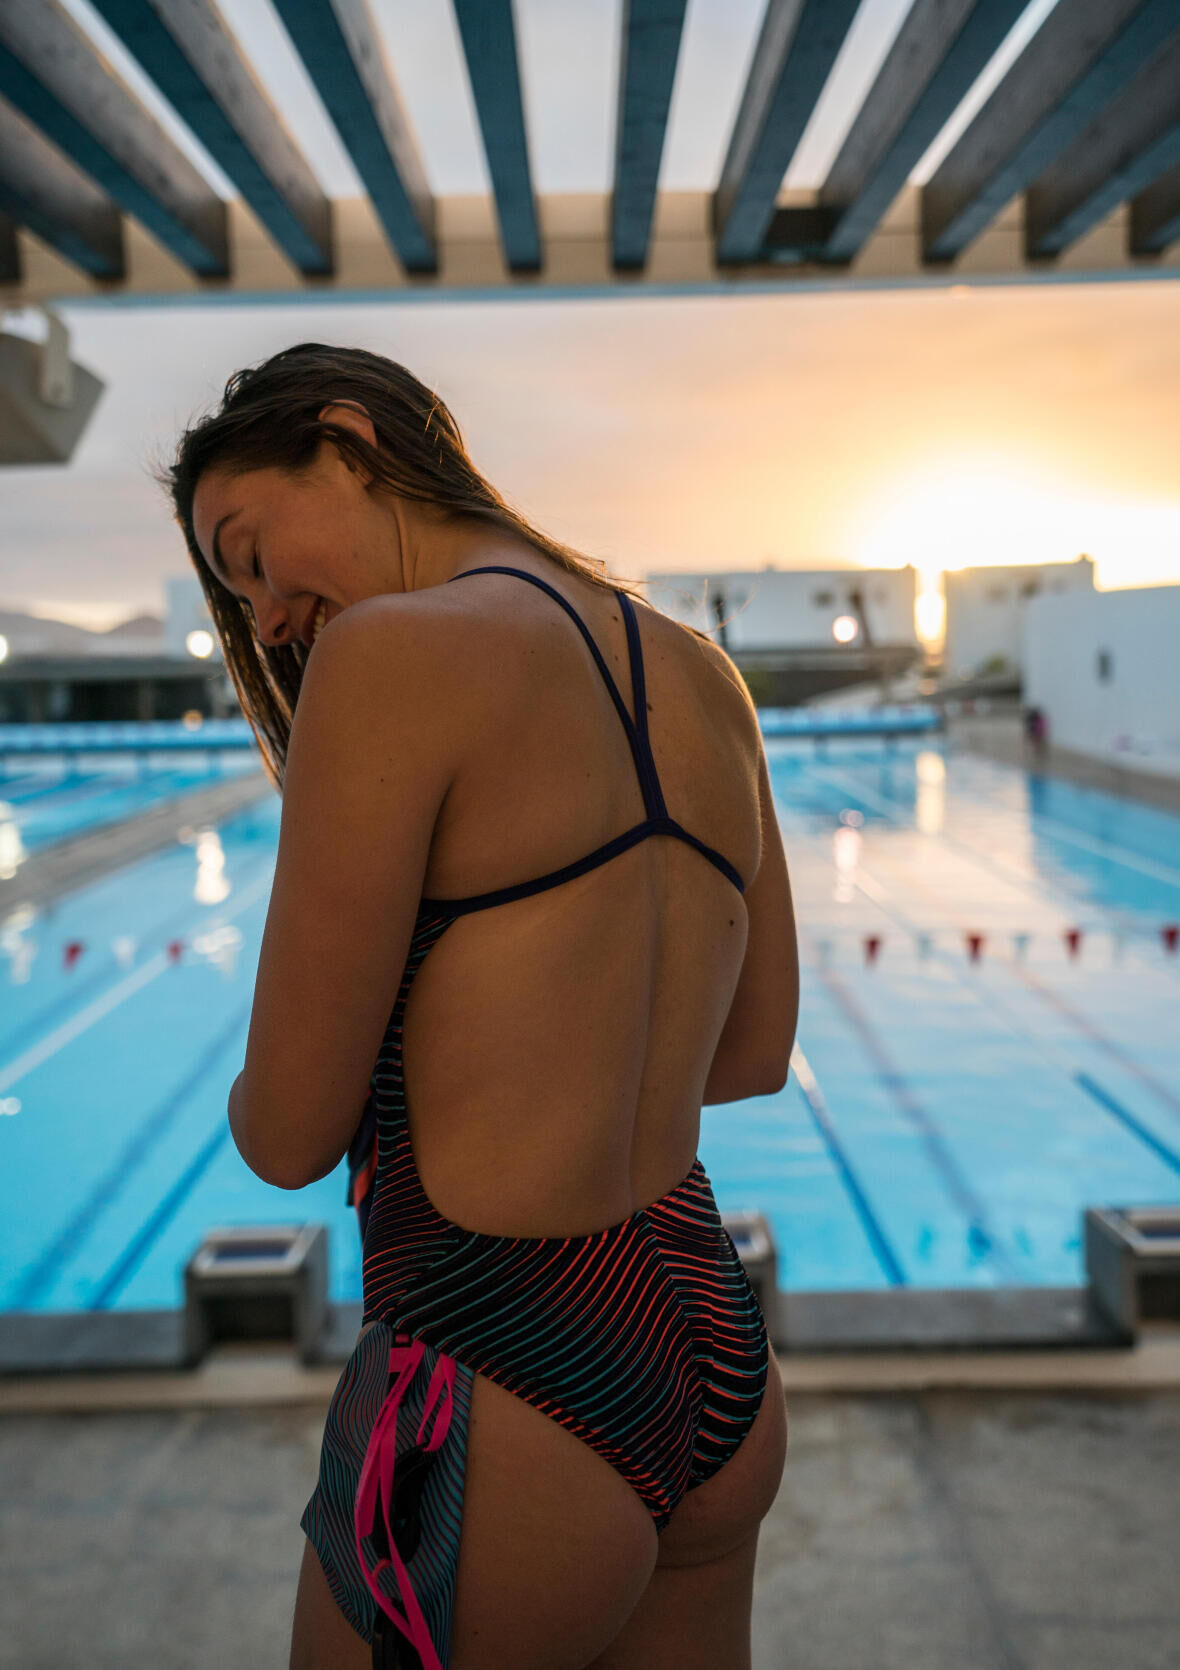 advance swimmer